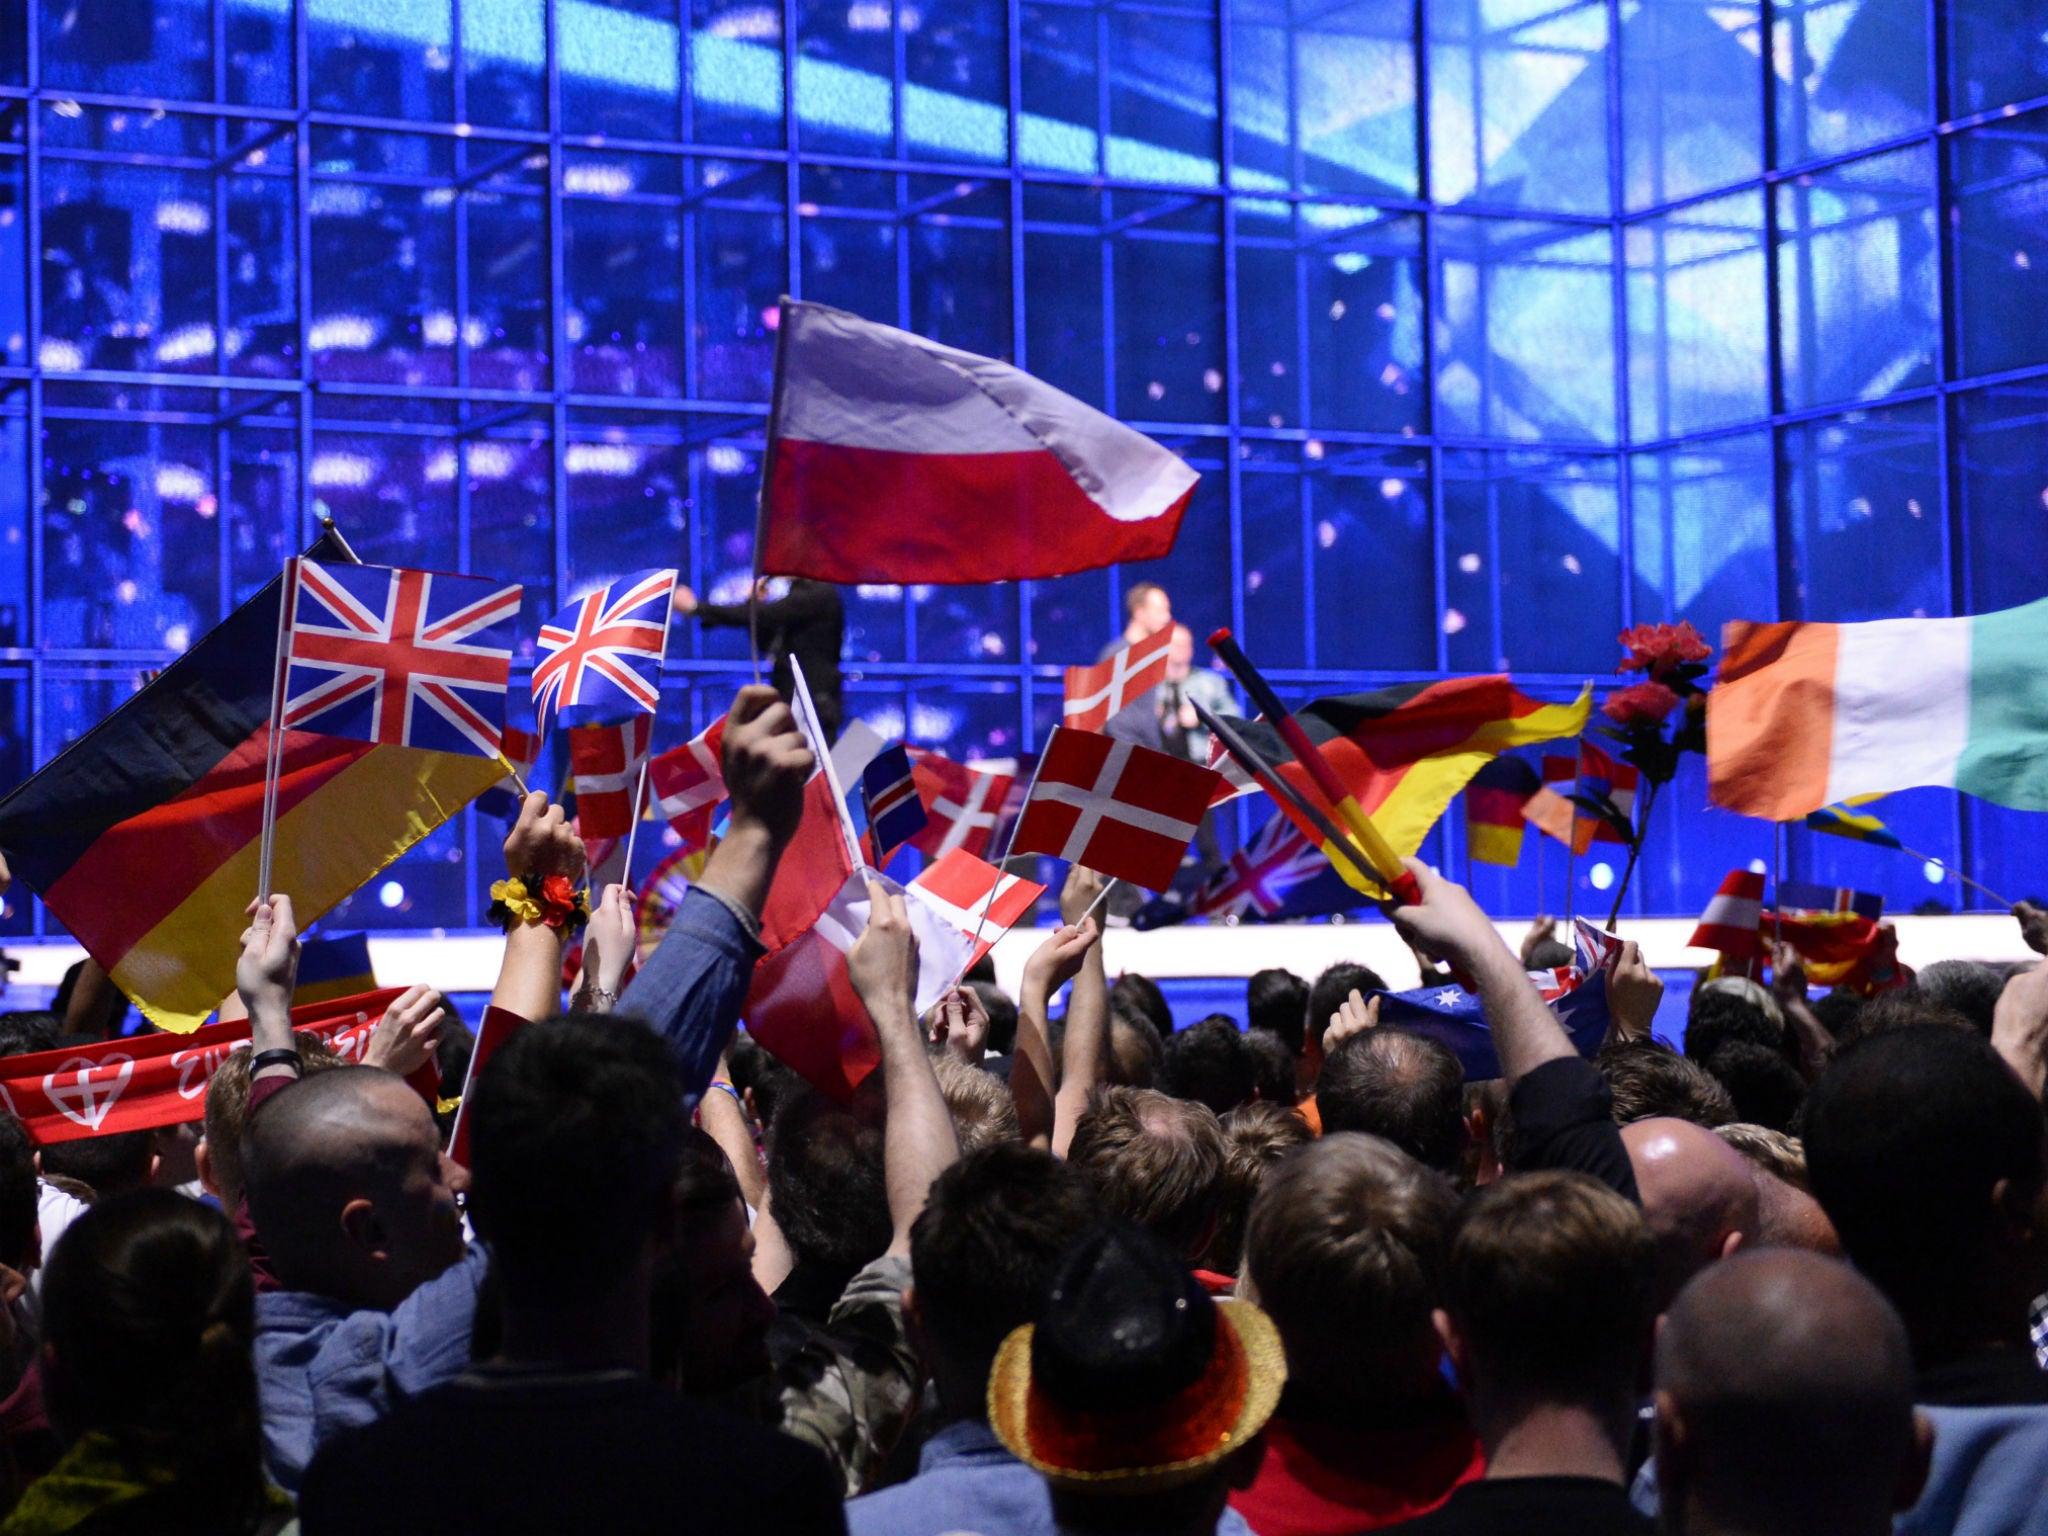 Eurovision: Europe Shine a Light as it happened – Graham Norton narrates emotional evening with live performances thumbnail